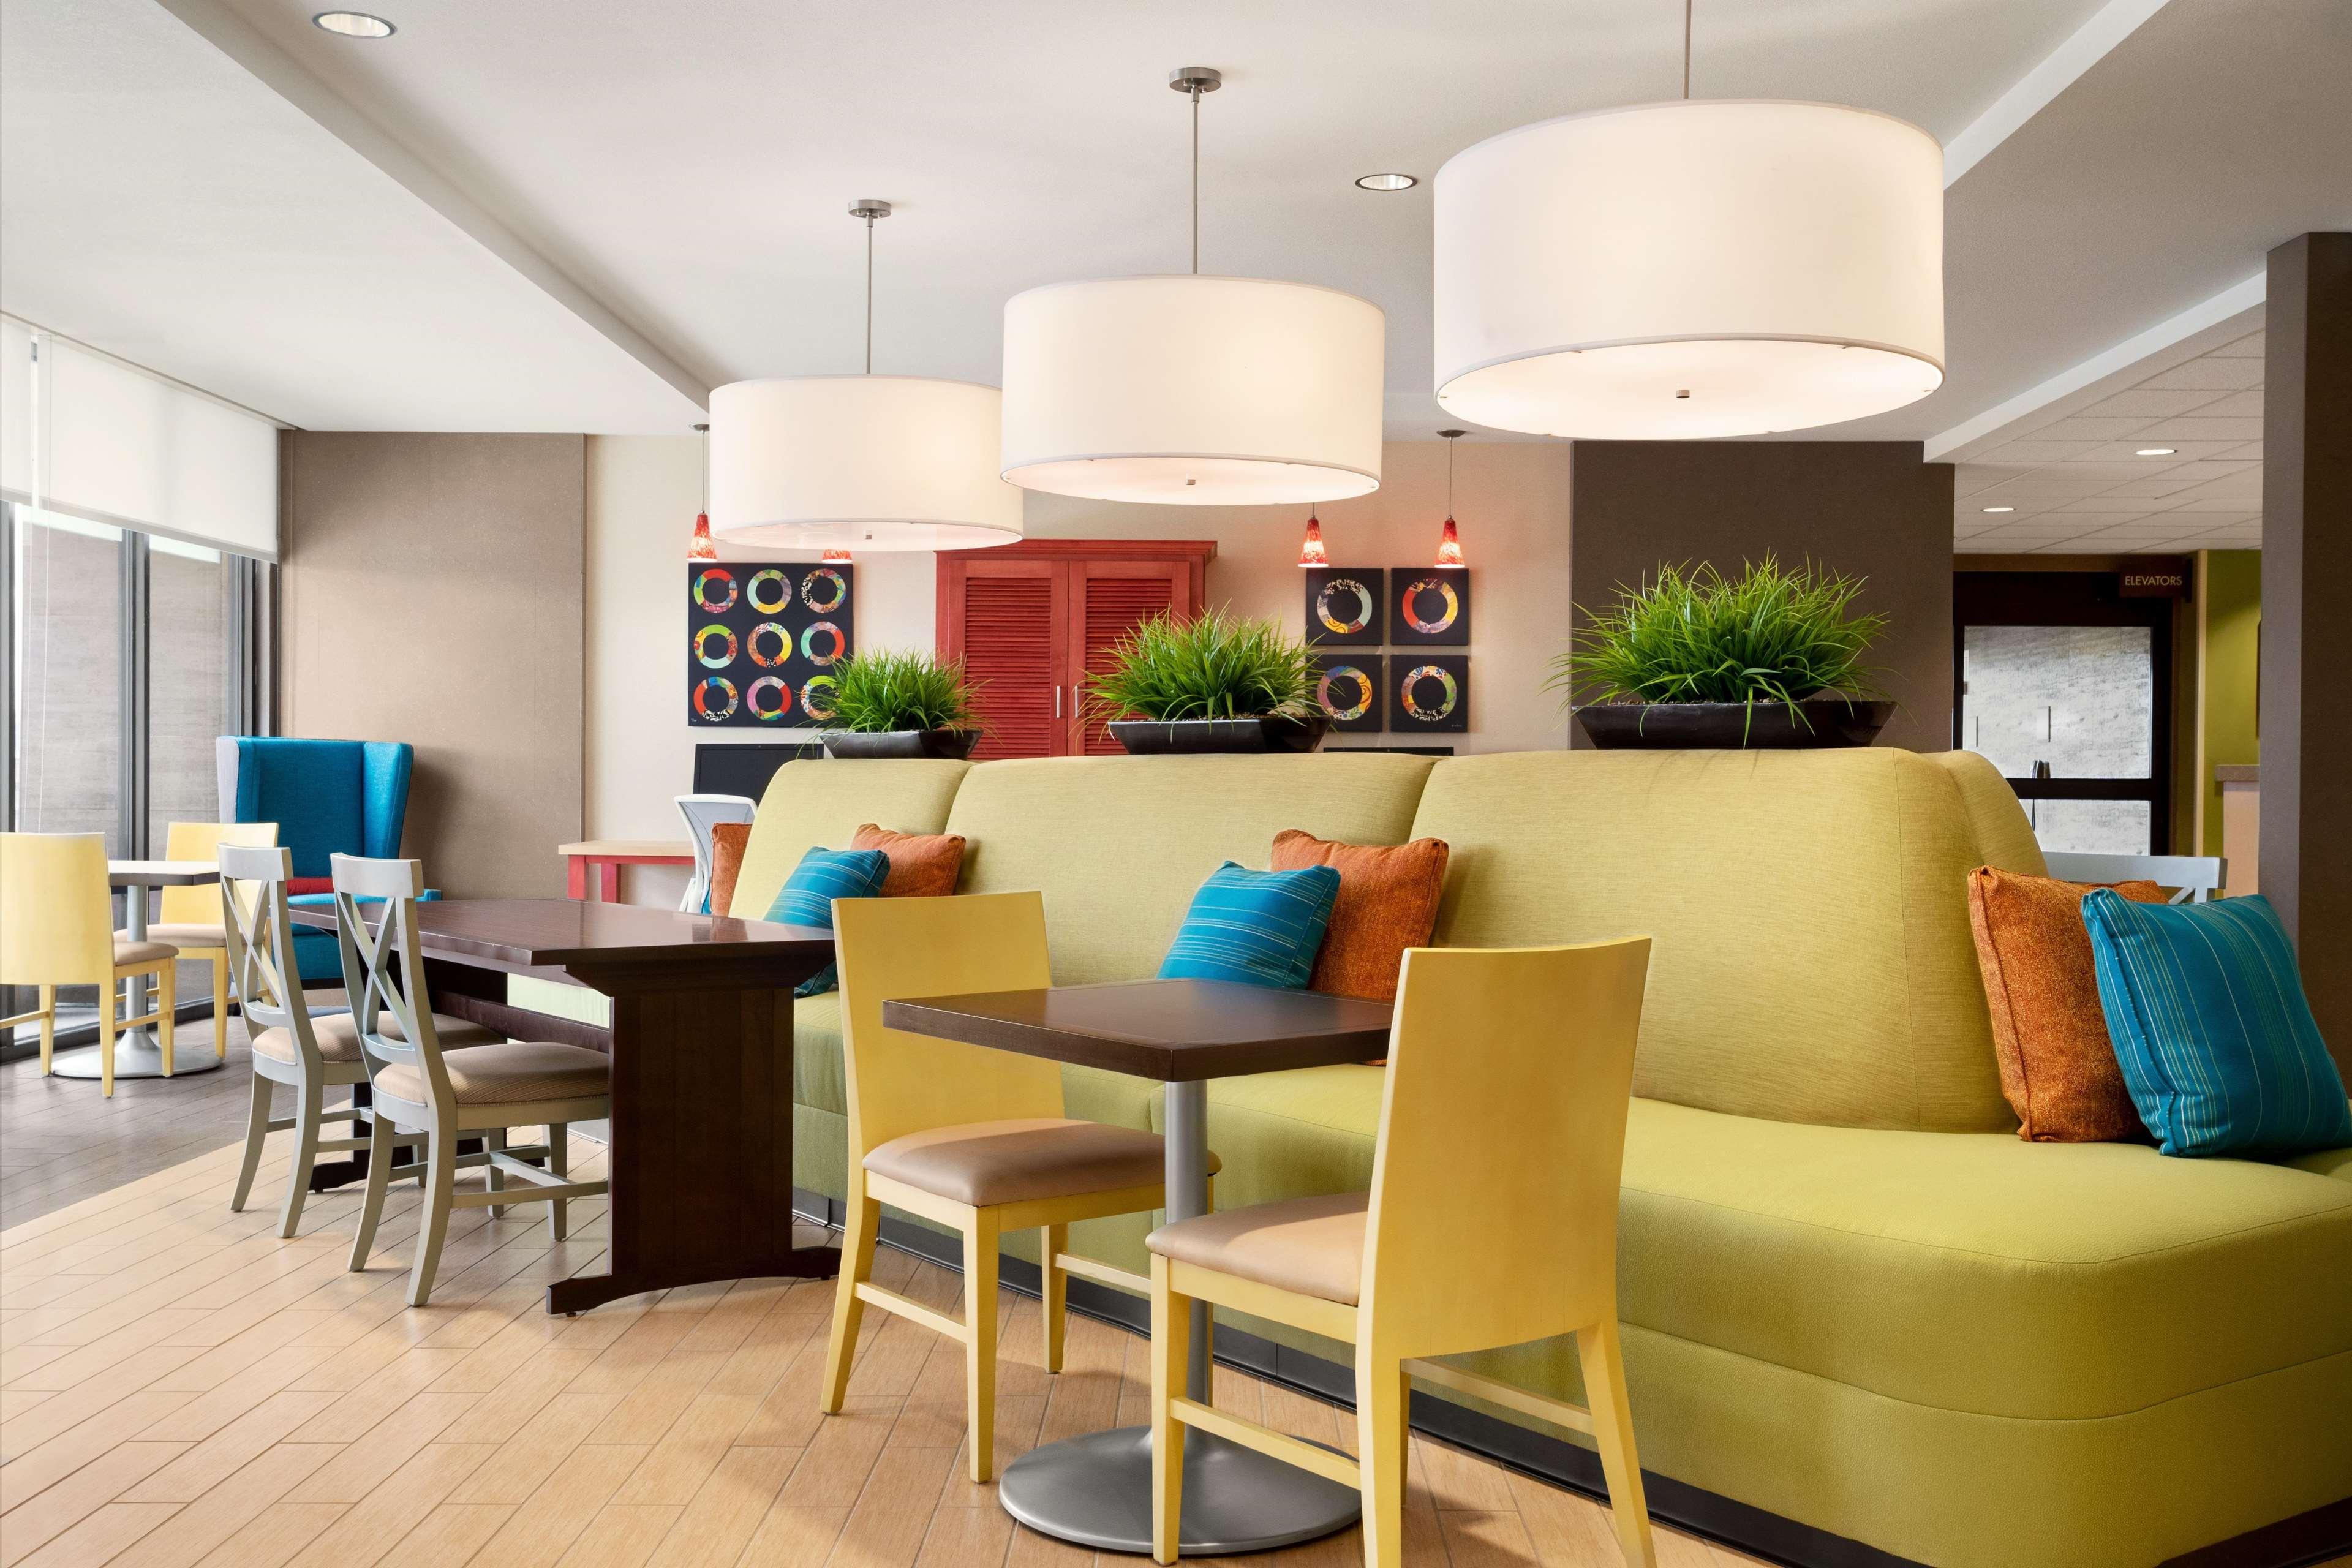 Home2 Suites by Hilton Elko image 7